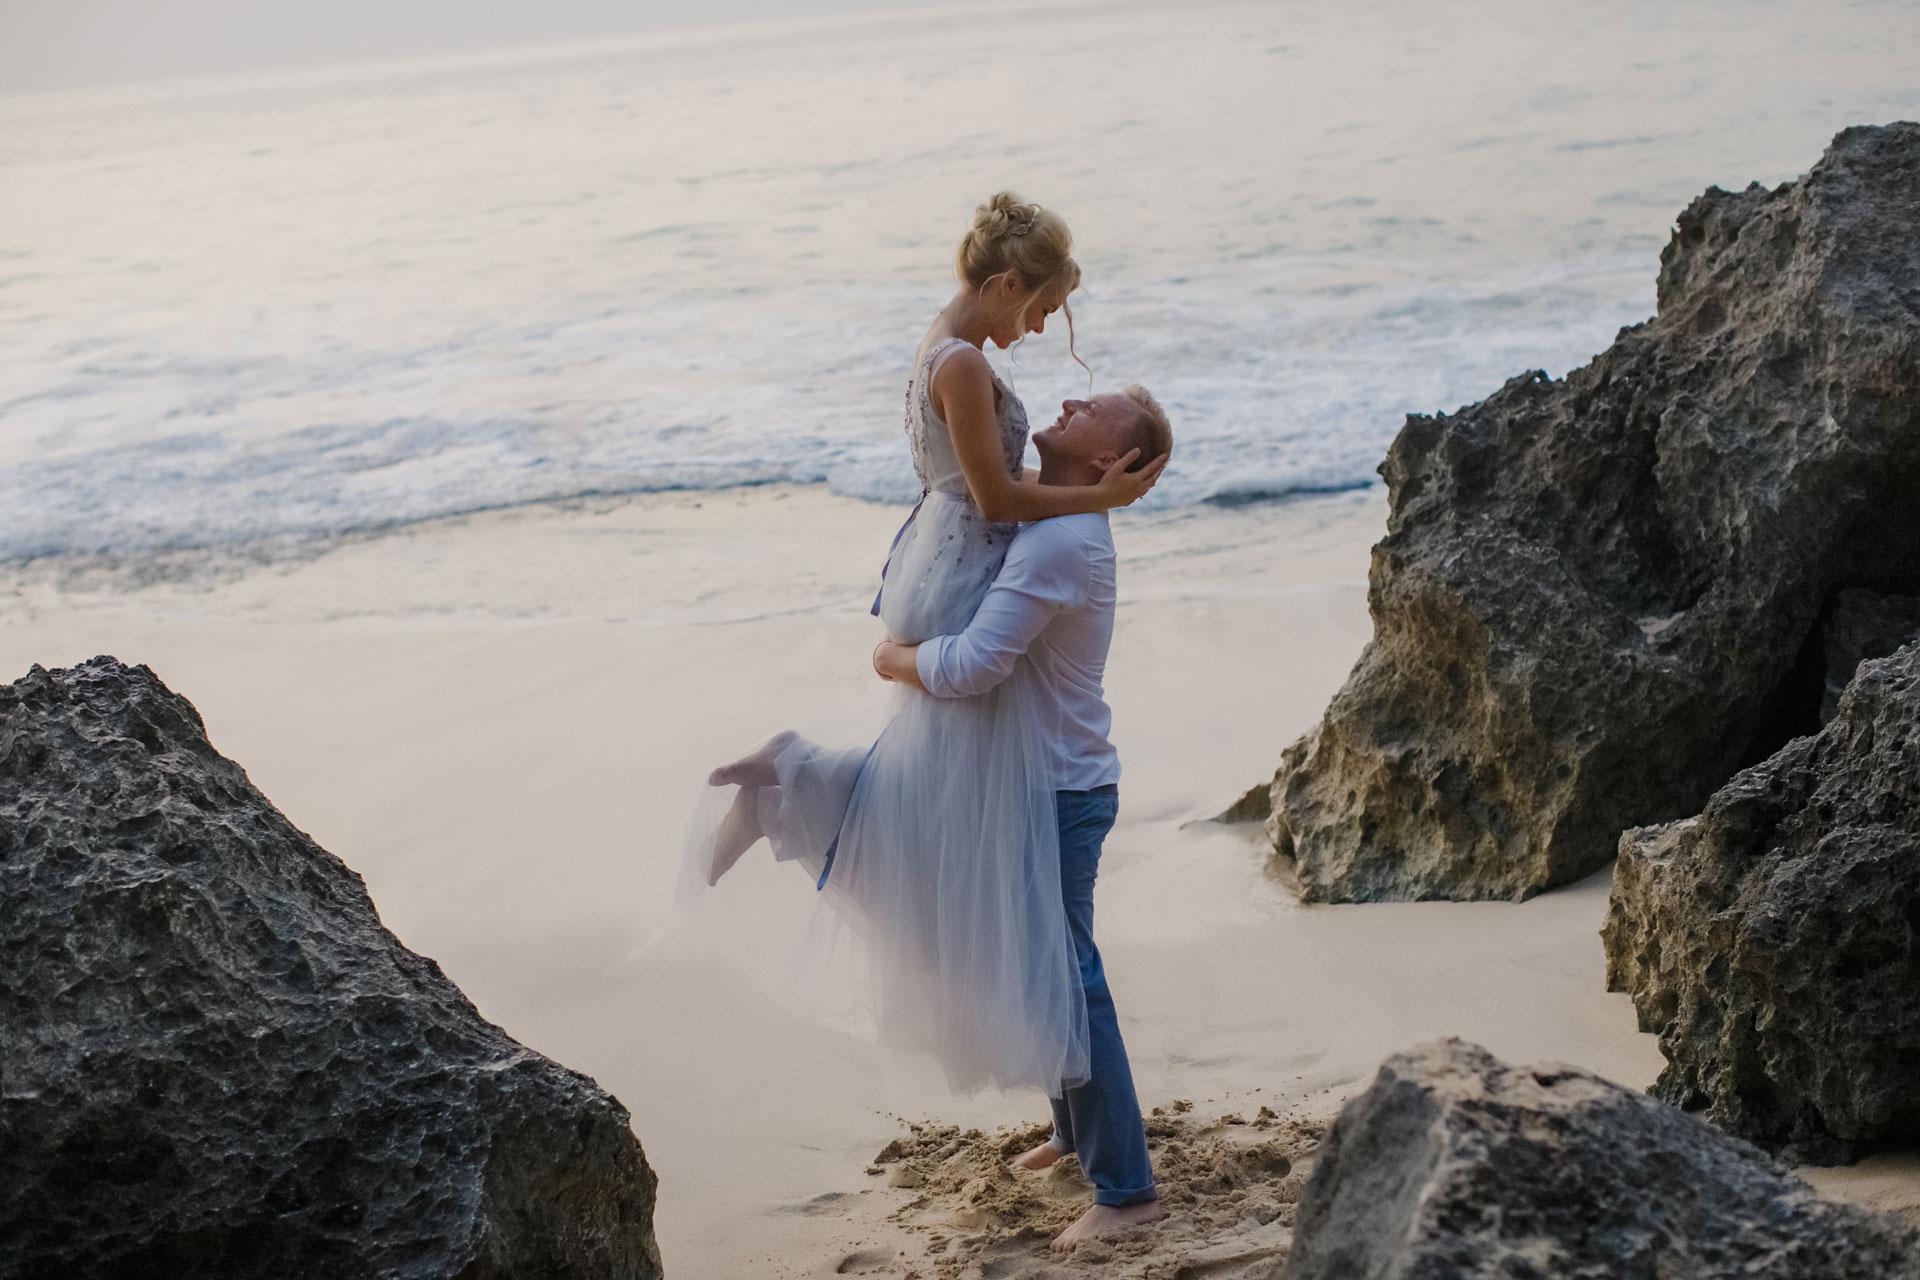 Серфинг на Бали. Свадьба Антона и Екатерины фото 23